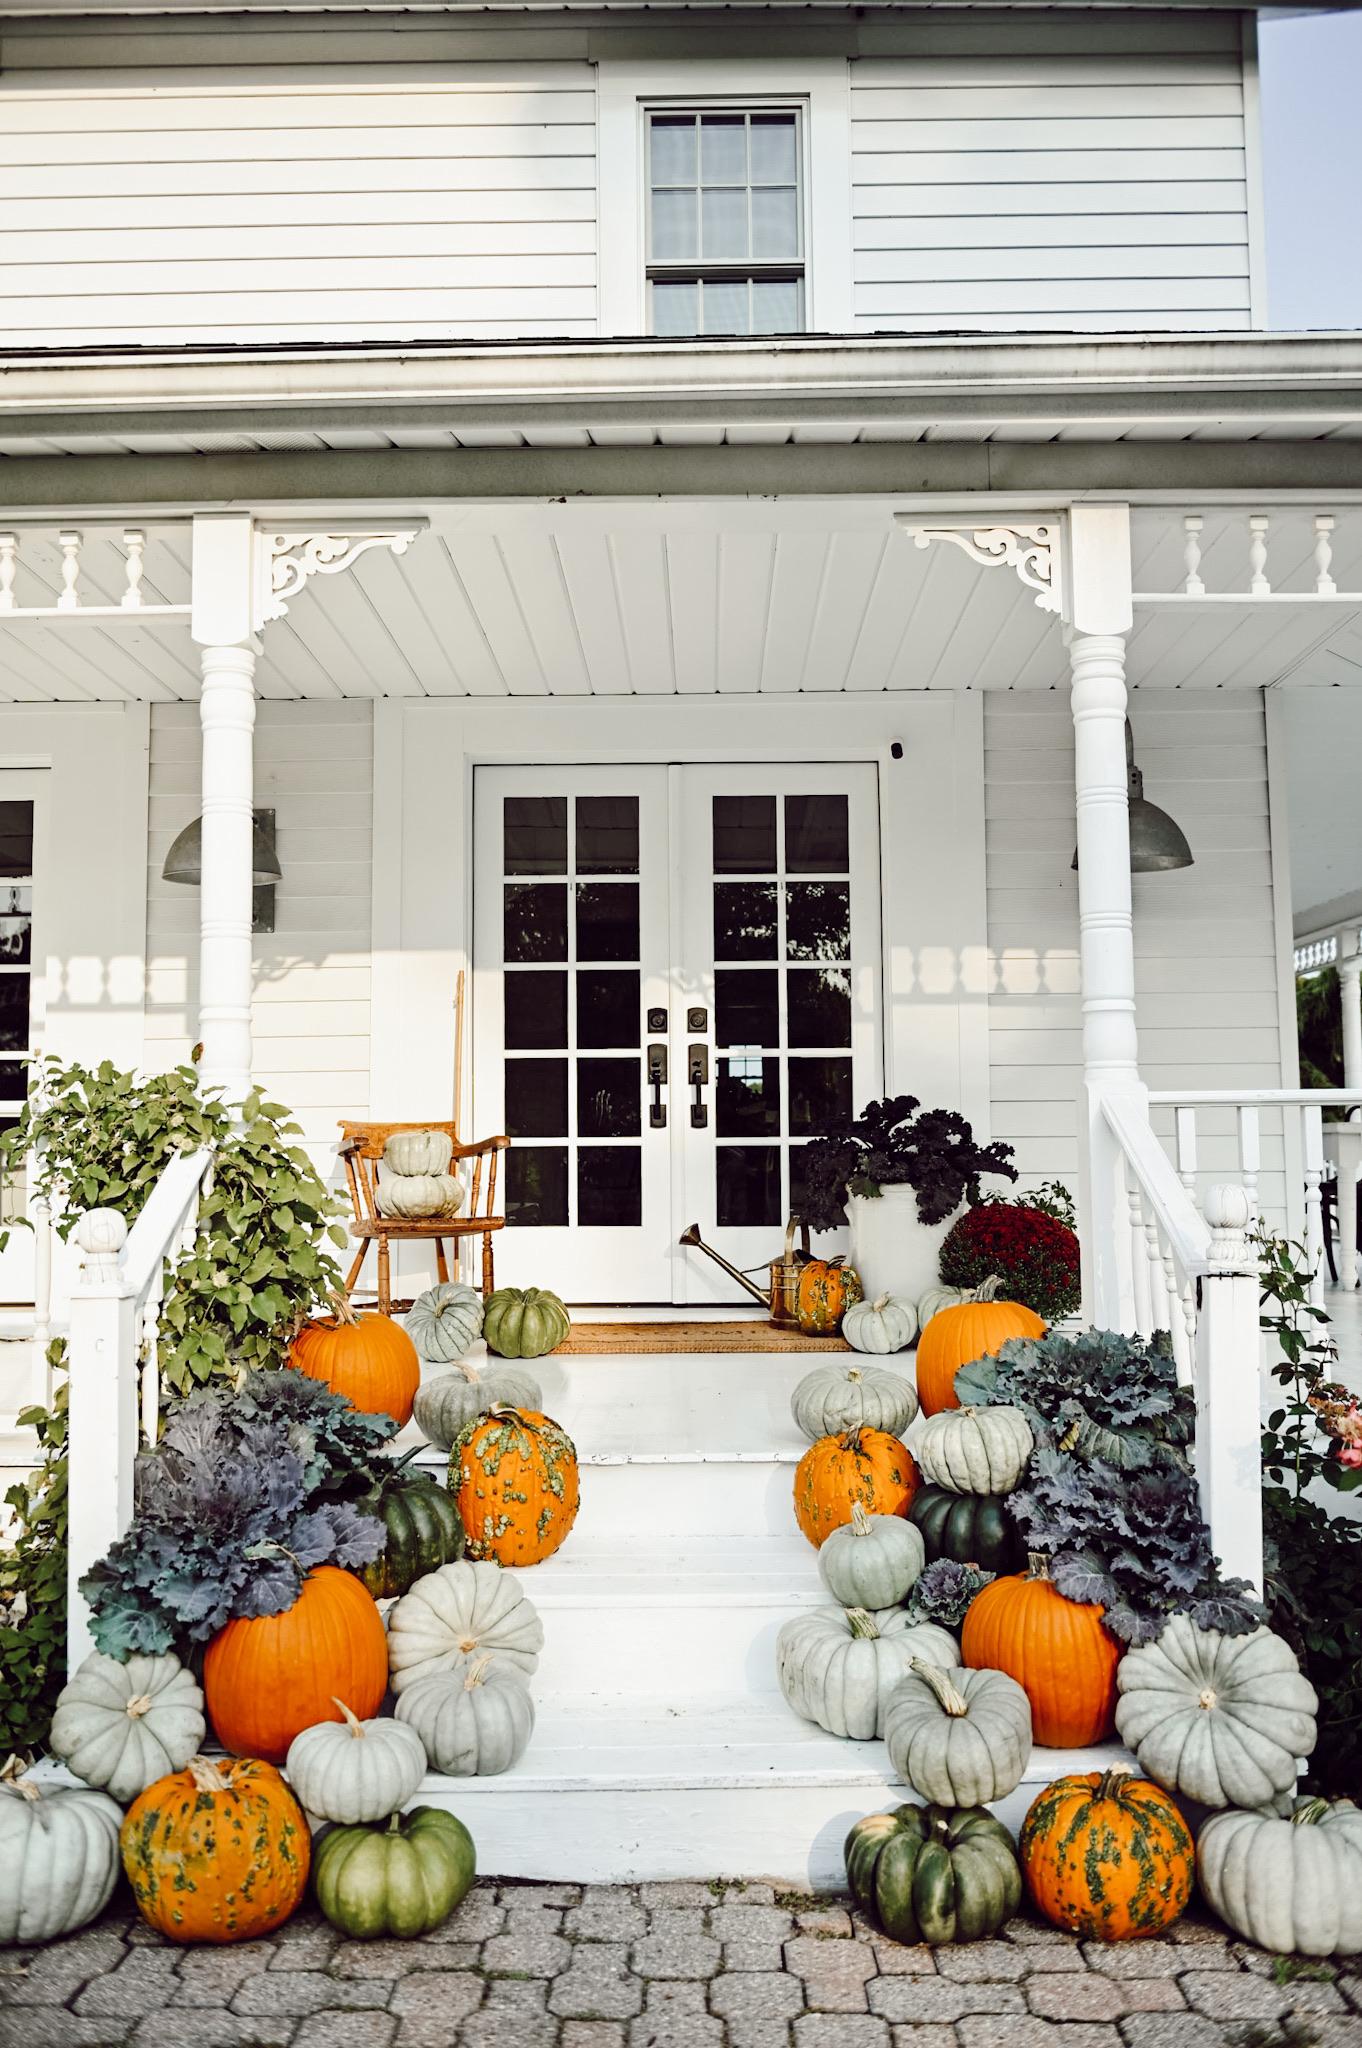 Kale & Pumpkin Porch Steps